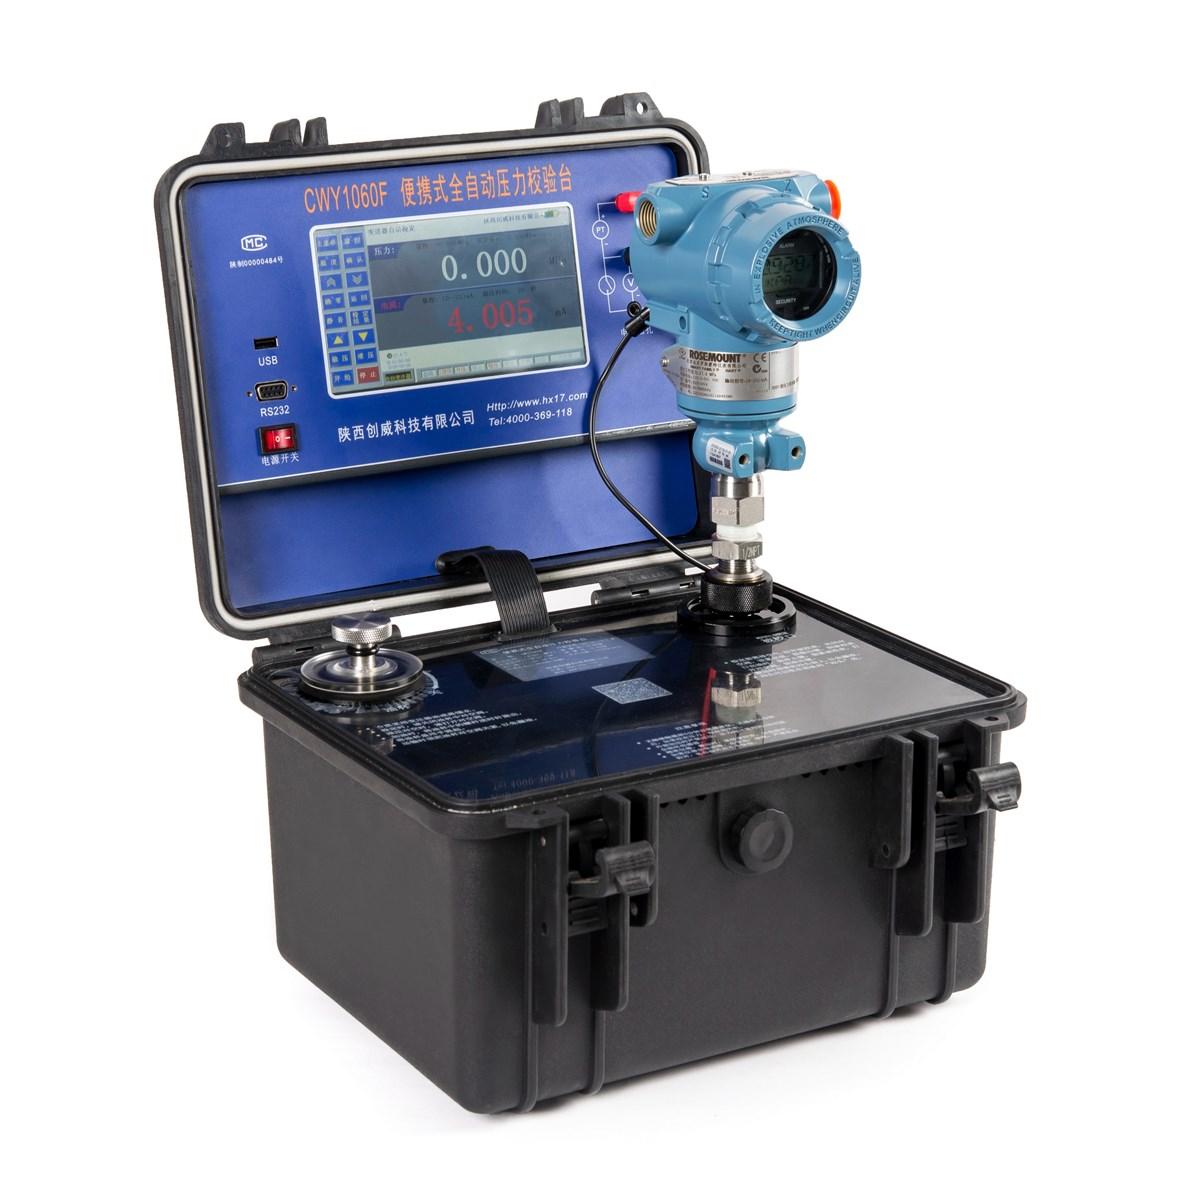 Automatic pressure calibrator with HART